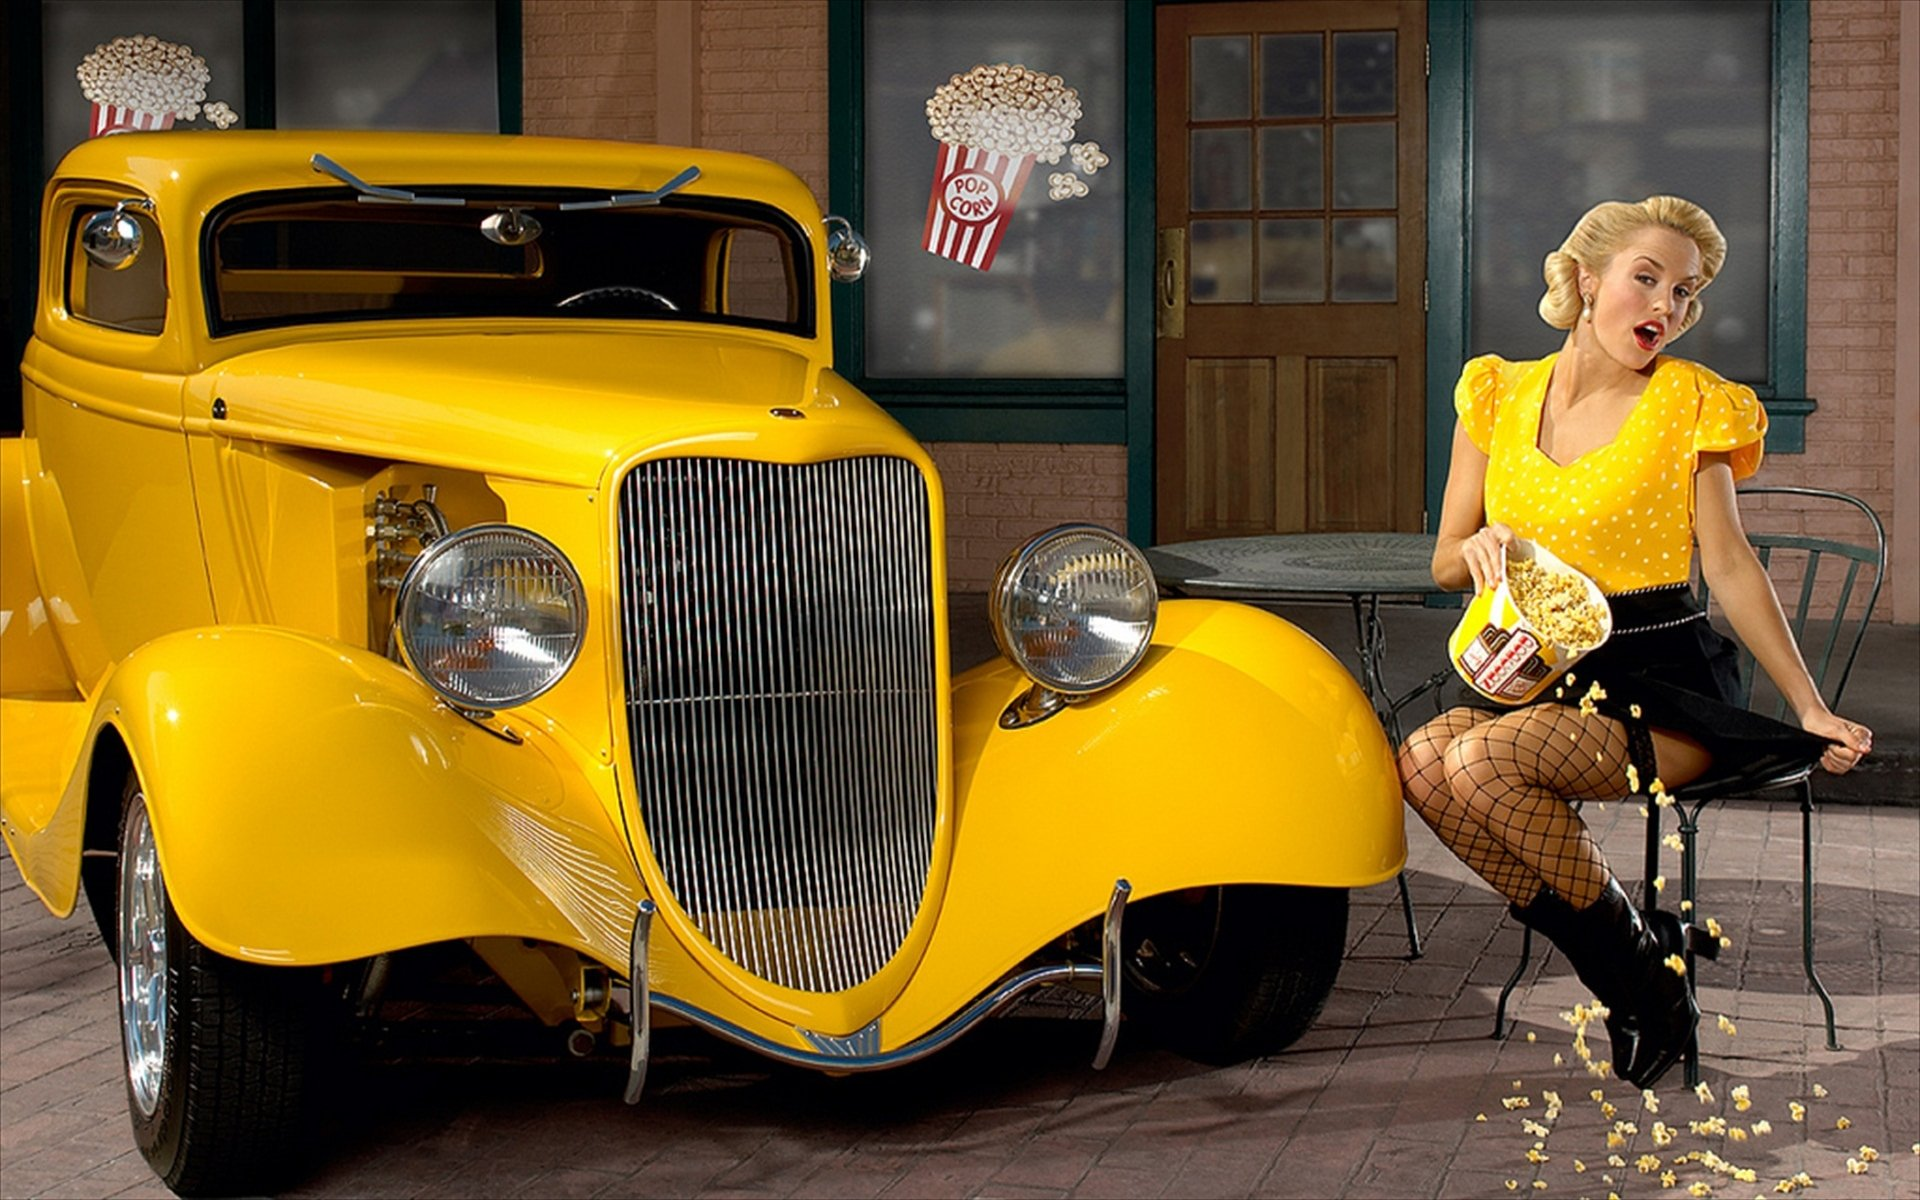 Wallpaper : model, long hair, car, vehicle, women with